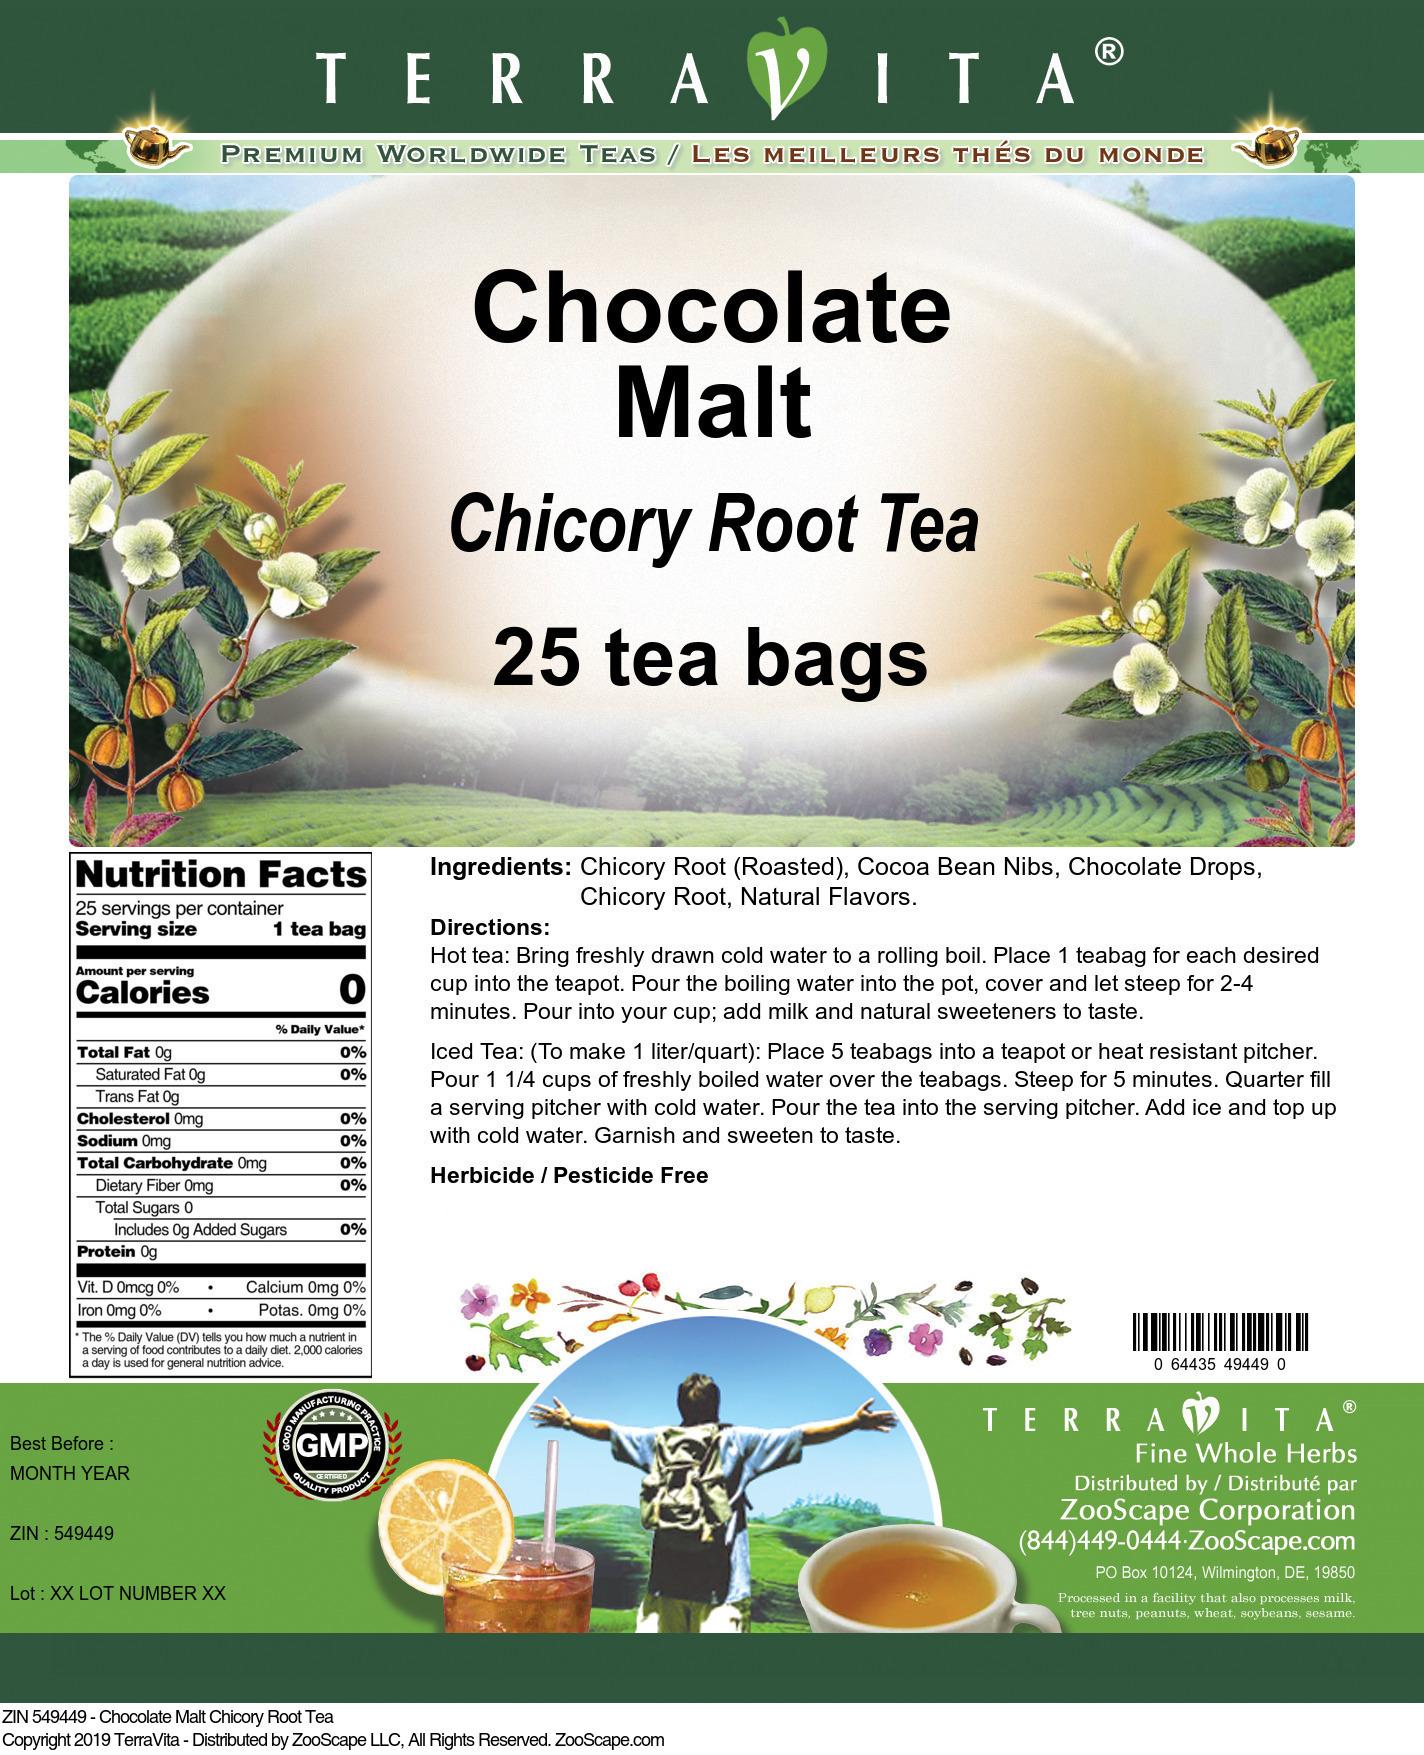 Chocolate Malt Chicory Root Tea